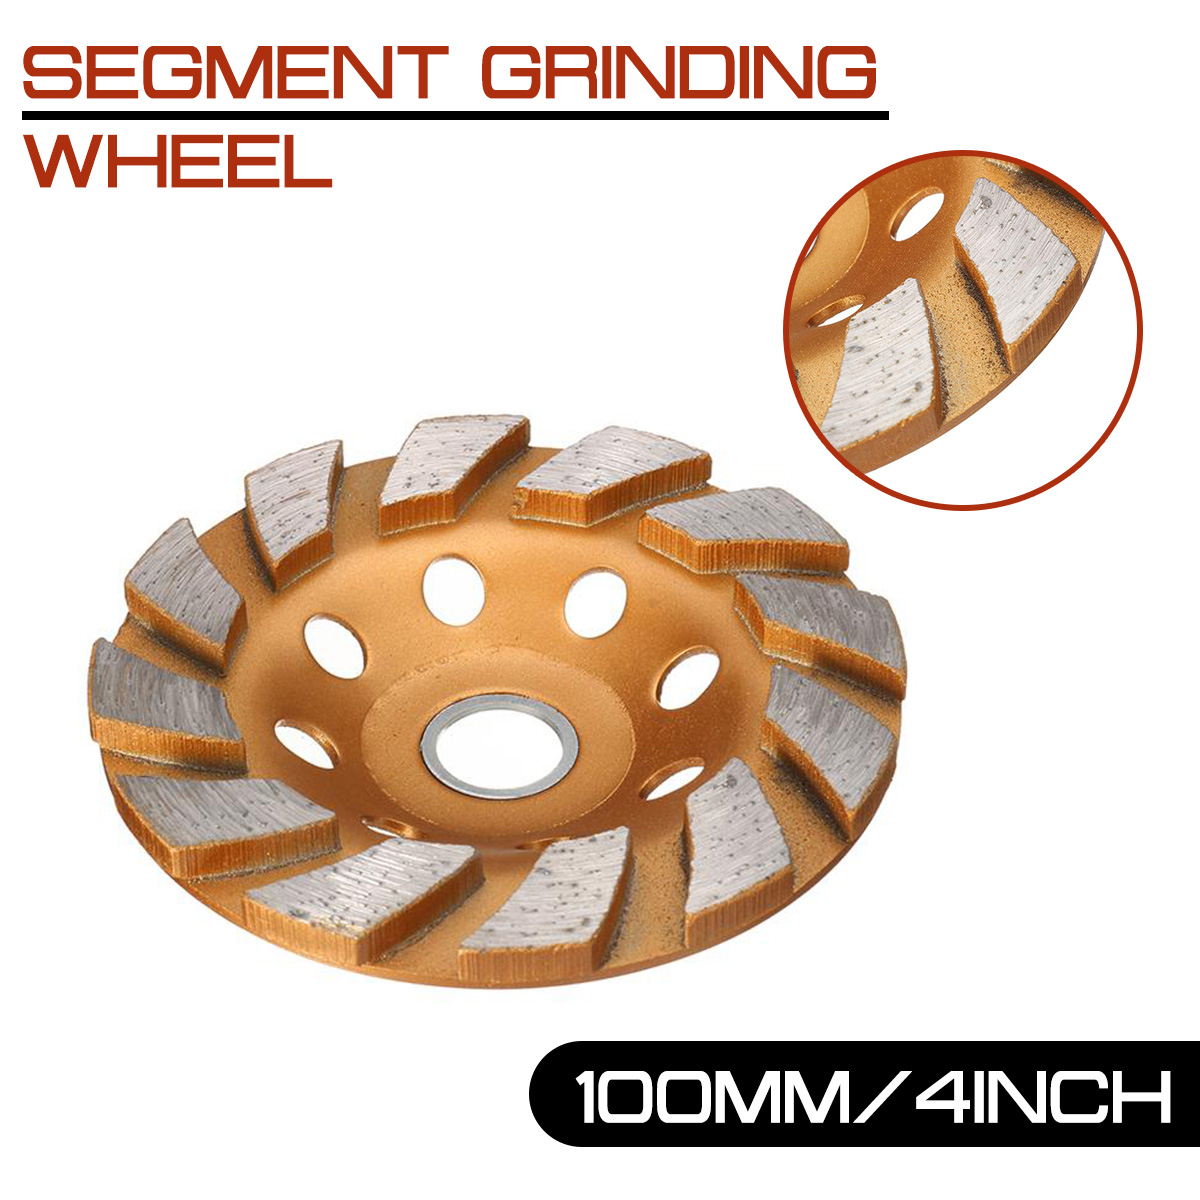 100mm/4inch Segment Grinding Wheel  HGS 8 Holes Diamond Grind Cup Disc Concrete Granite Stone Grinder DIY Power Tool